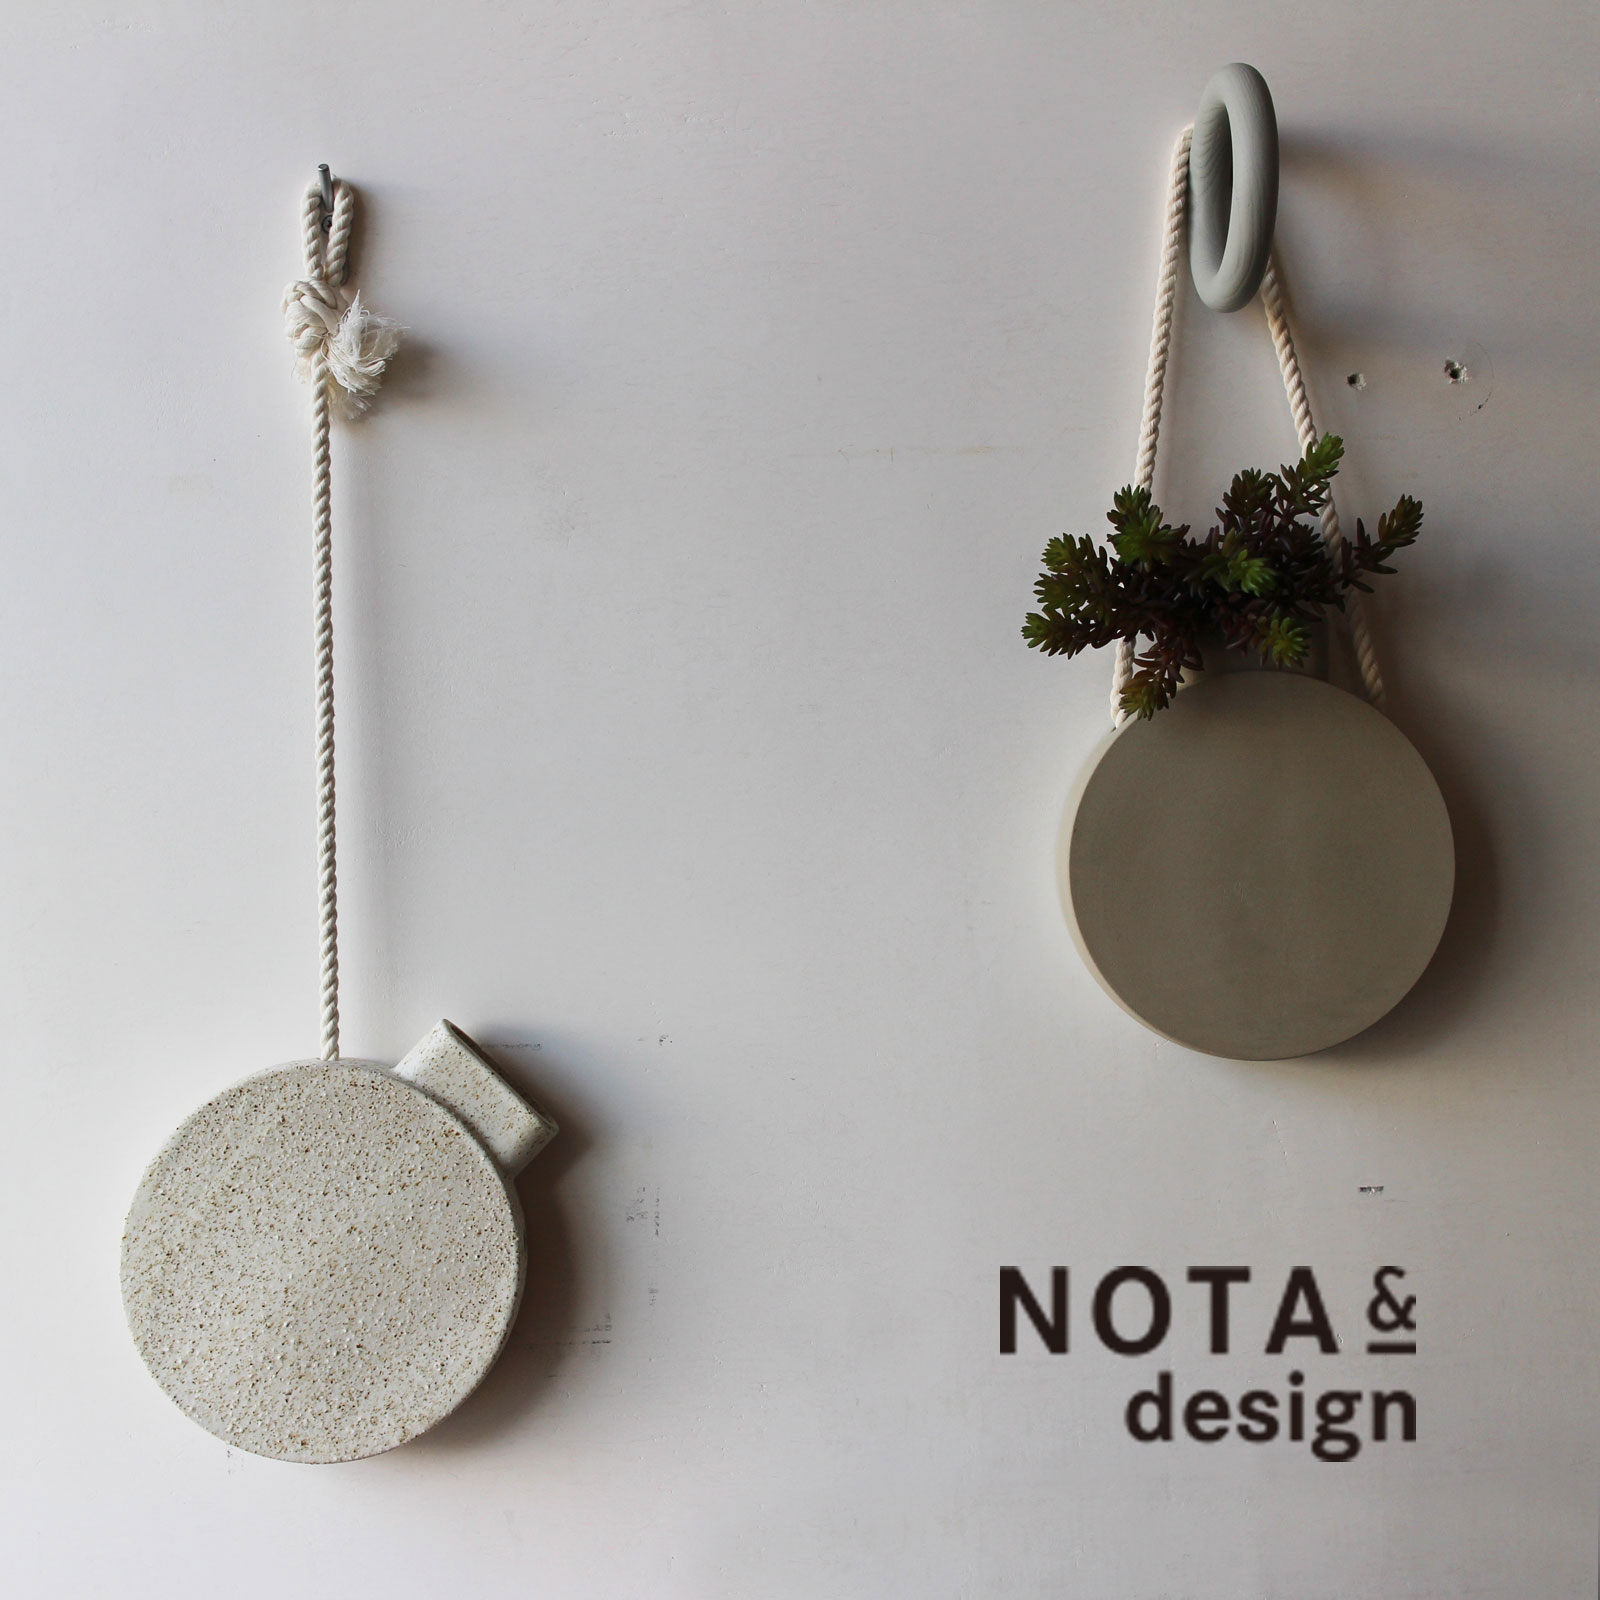 NOTA&design